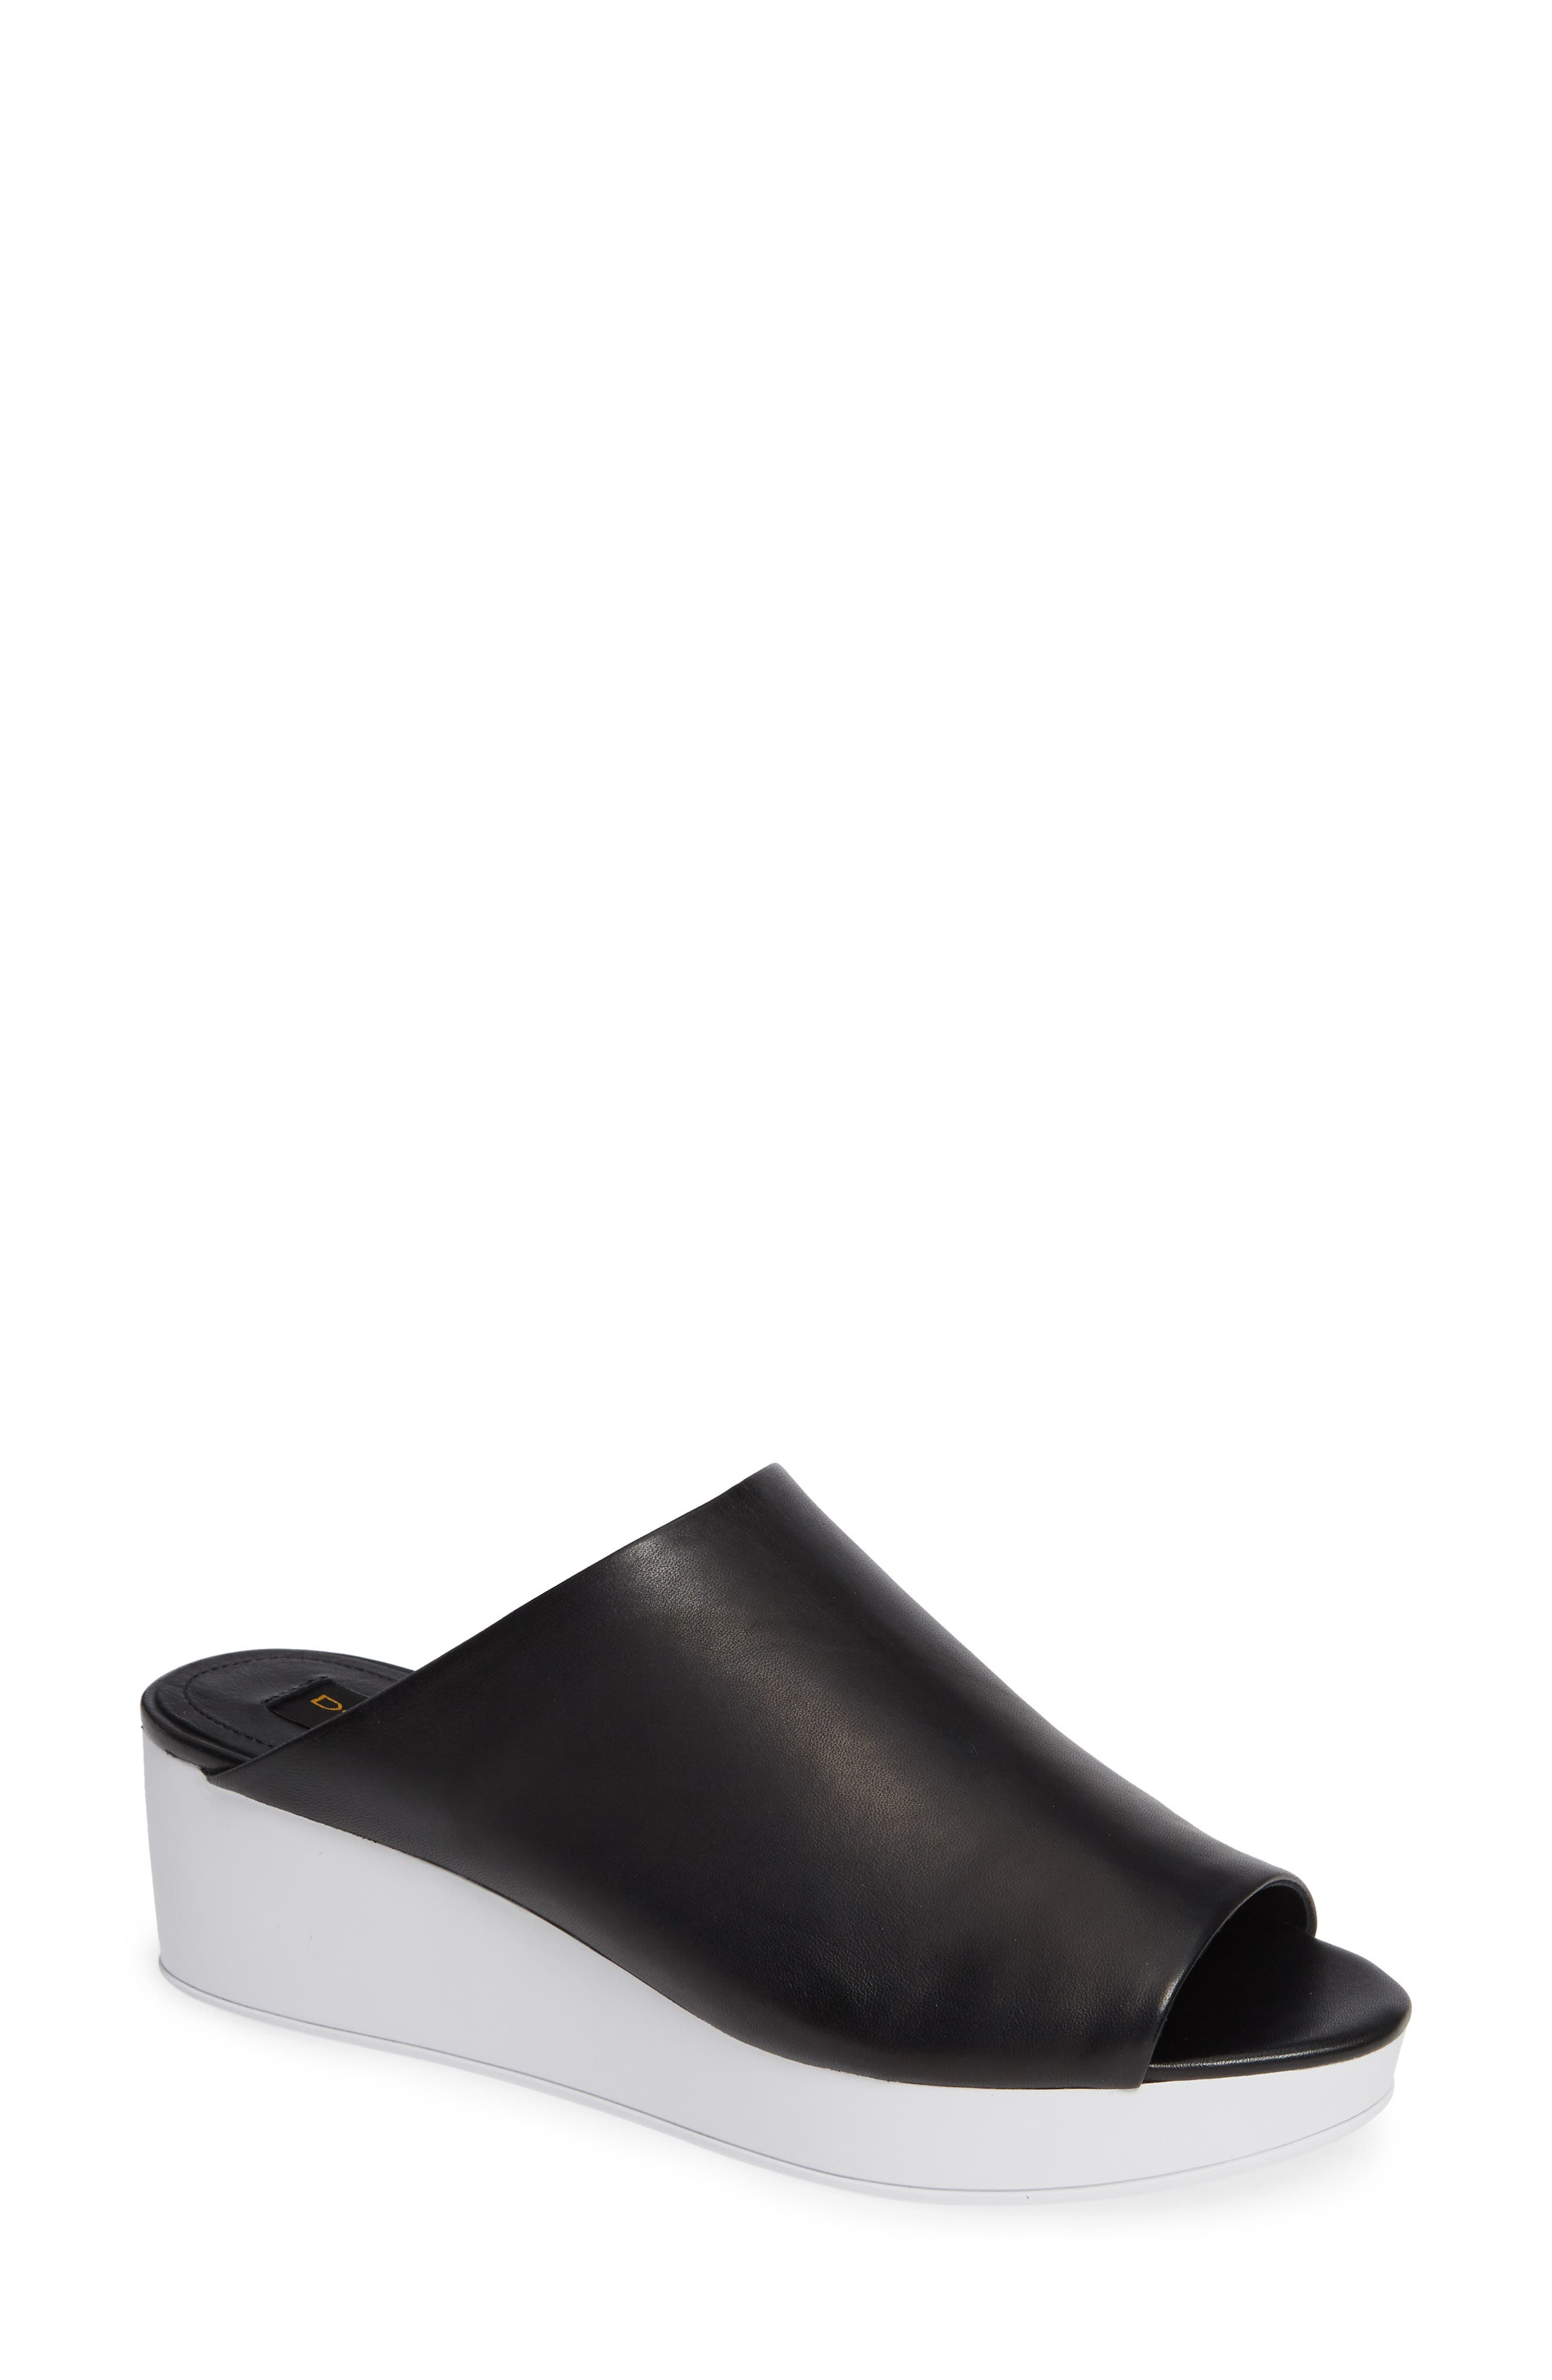 Donna Karan Reisley Wedge Slide Sandal,                             Main thumbnail 1, color,                             BLACK LEATHER